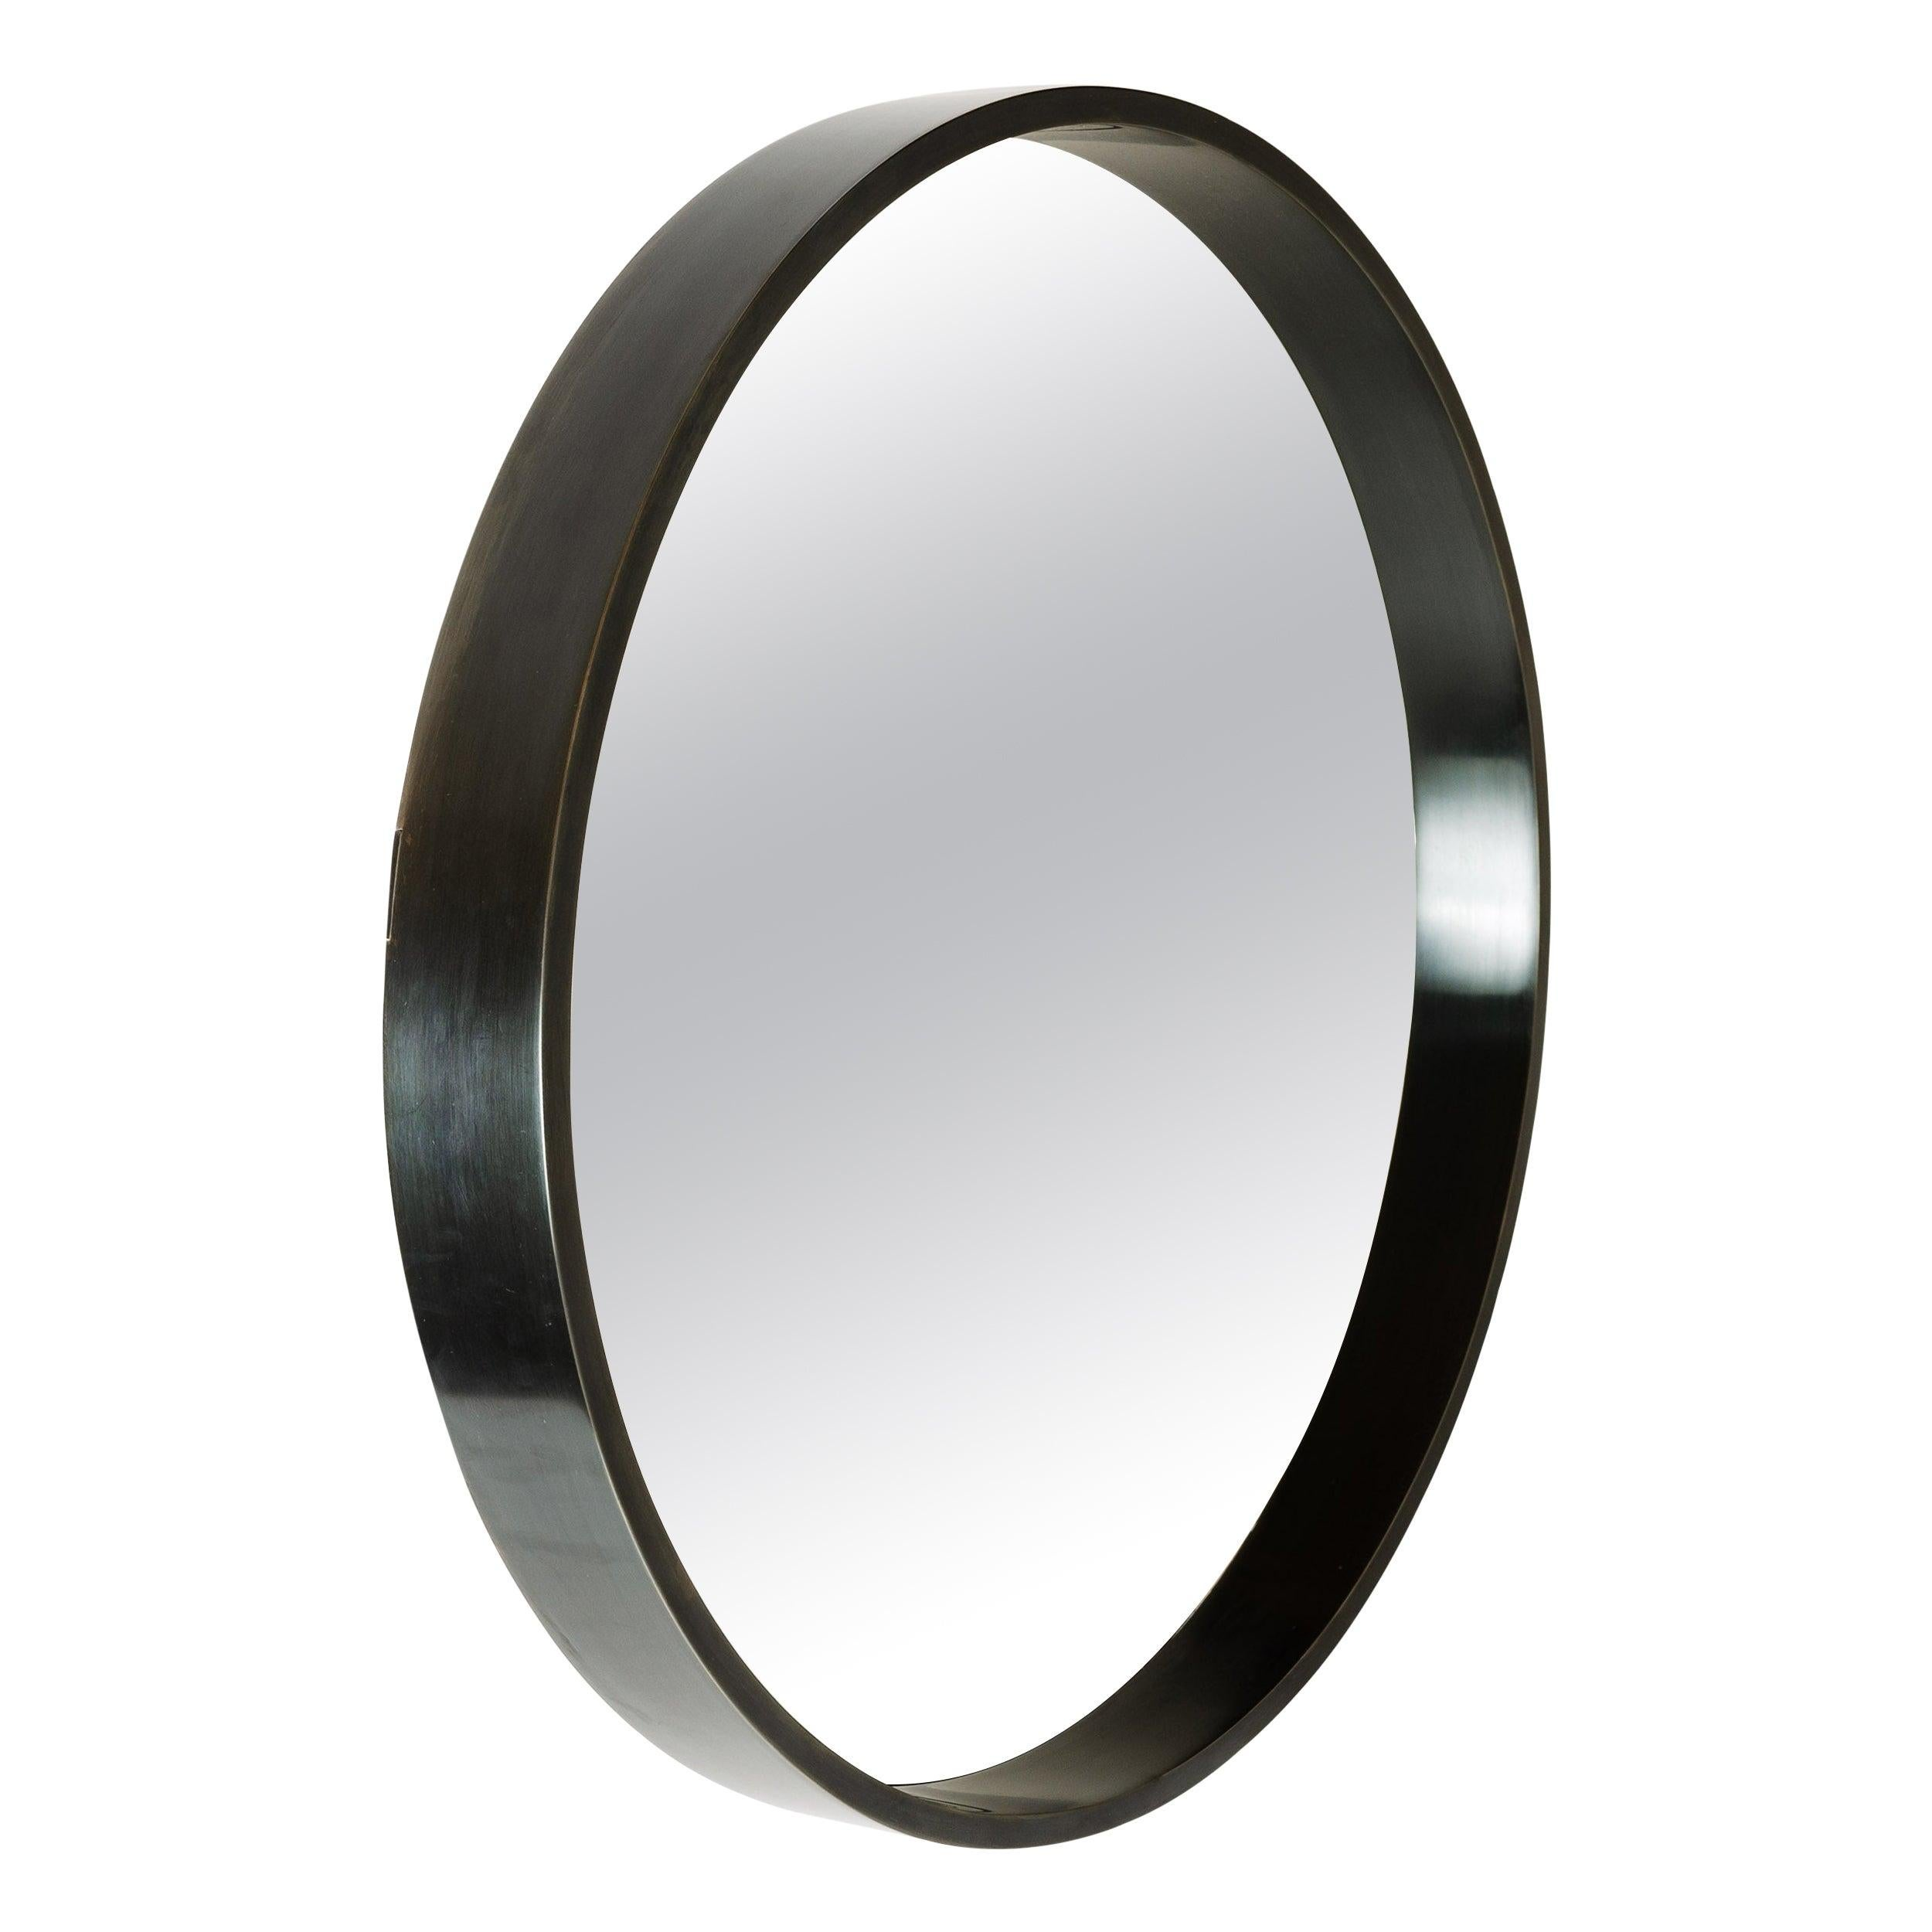 WYETH Original Bronze Perfect Ring Mirror